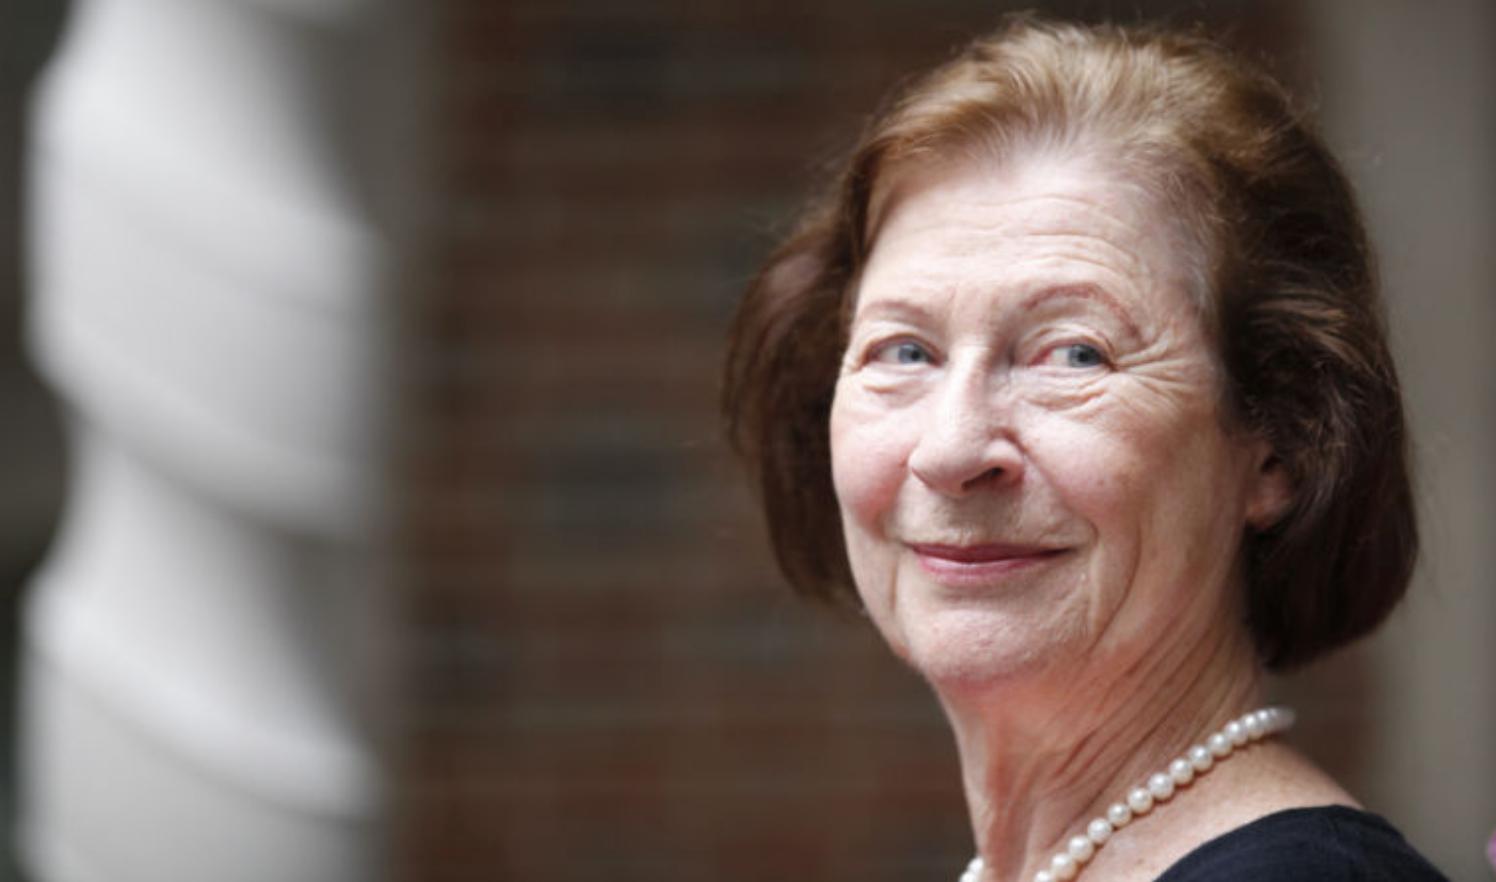 Dr. Gabara at her retirement celebration in 2013.